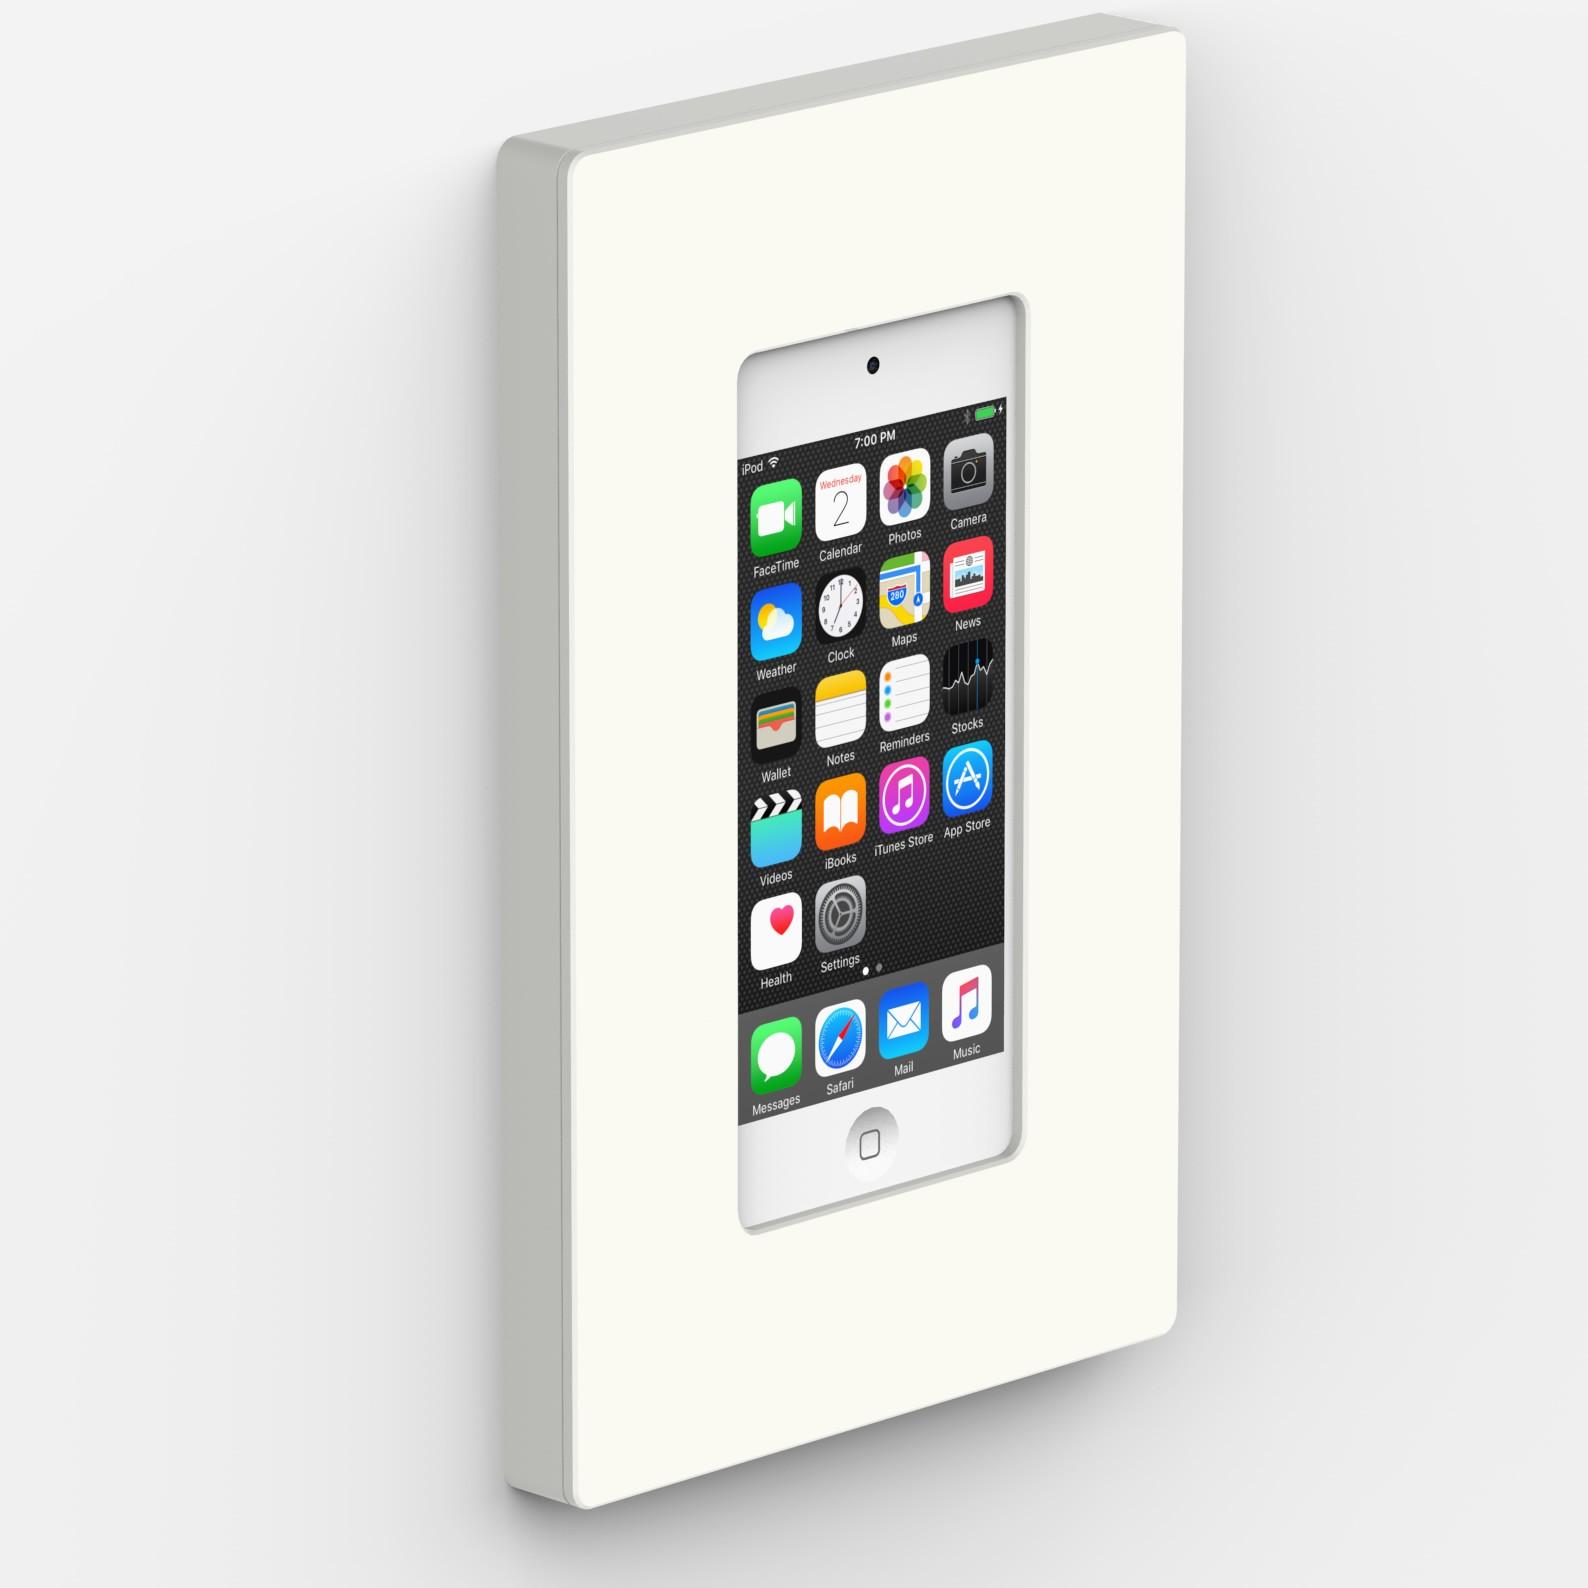 White - iPod 5th & 6th Generation - VidaMount On-Wall Enclosure Mount